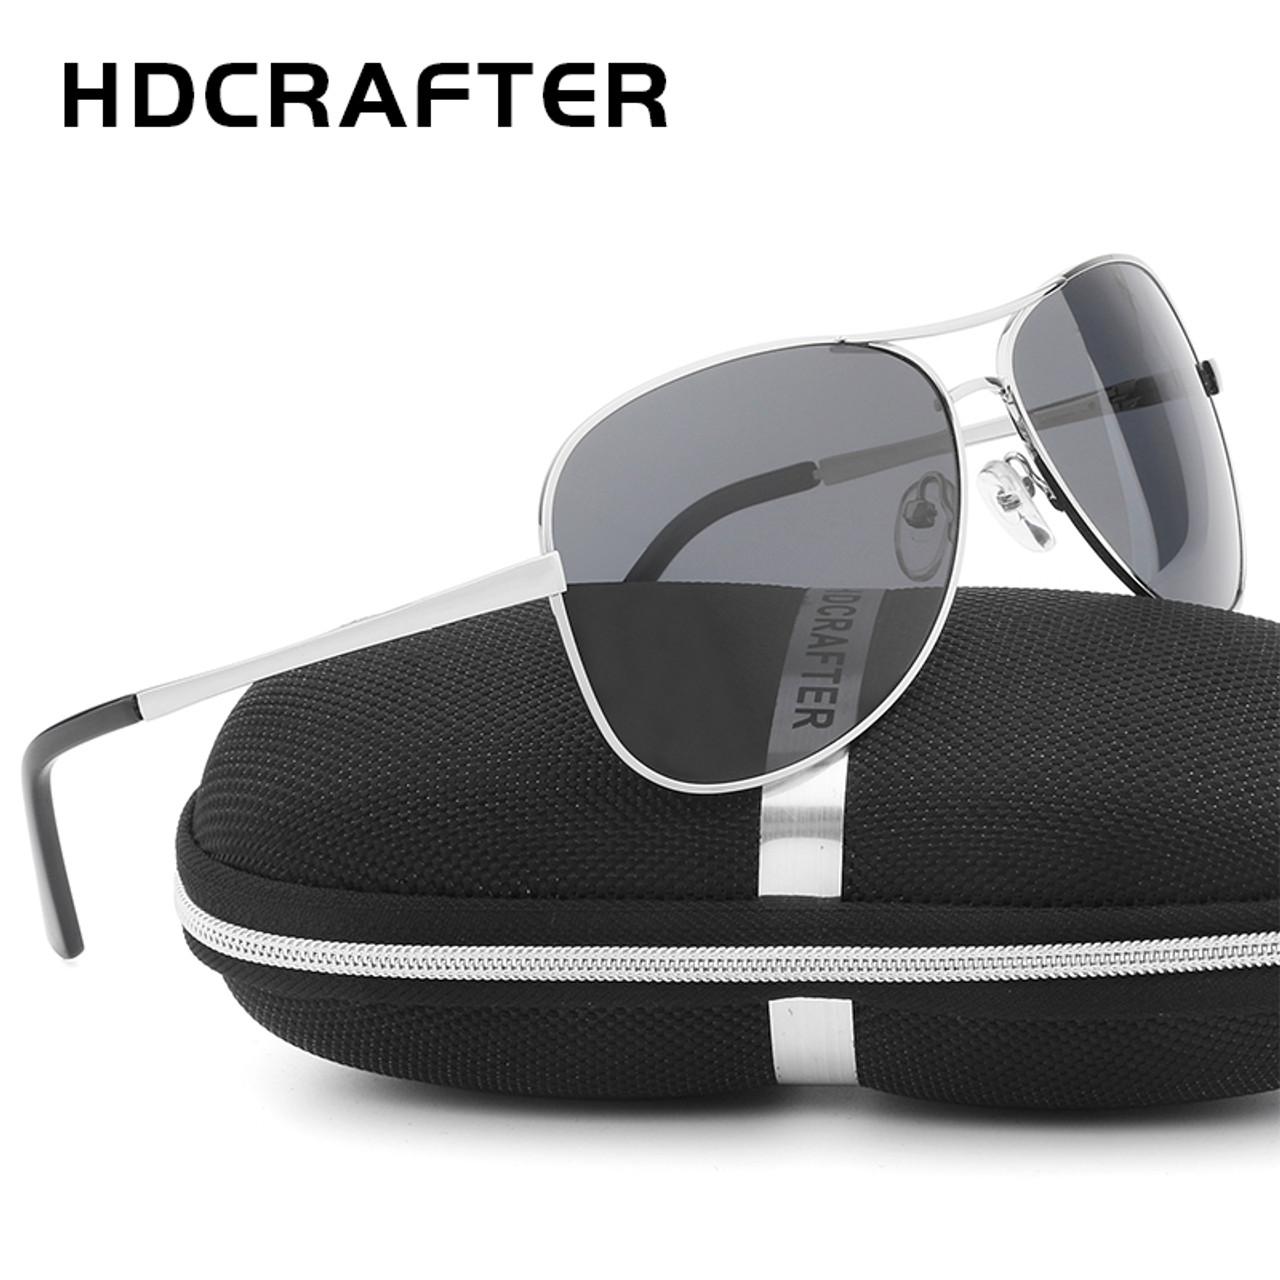 7b61af1f8e ... HDCRAFTER Aviator Sunglasses Men Polarized Sun Glasses For Men fashion  UV400 driving outdoor sunglasses with box ...